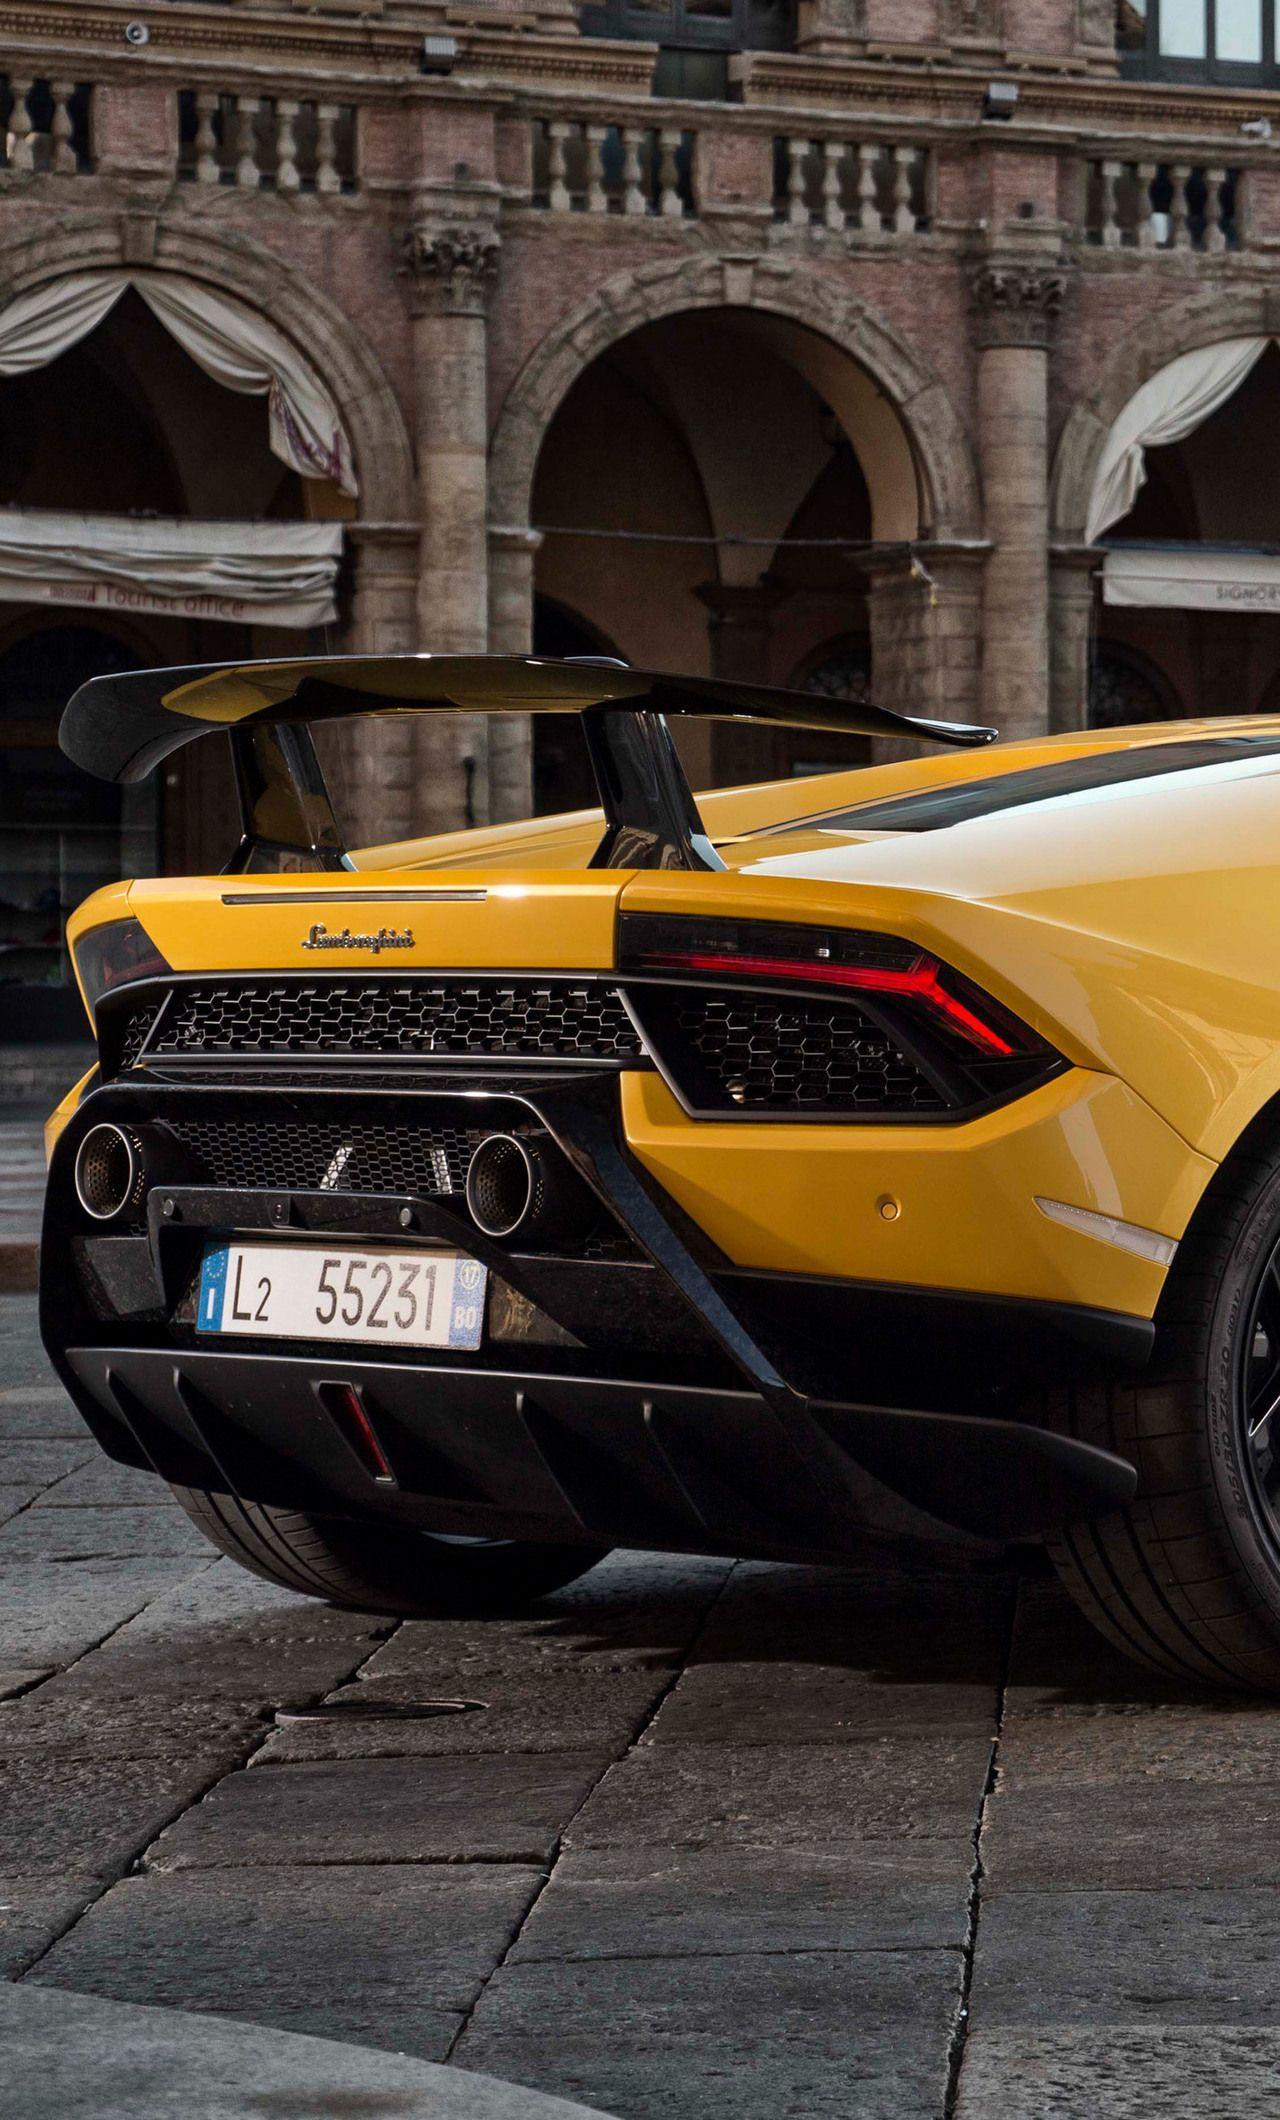 Lamborghini Huracan Iphone Wallpapers Top Free Lamborghini